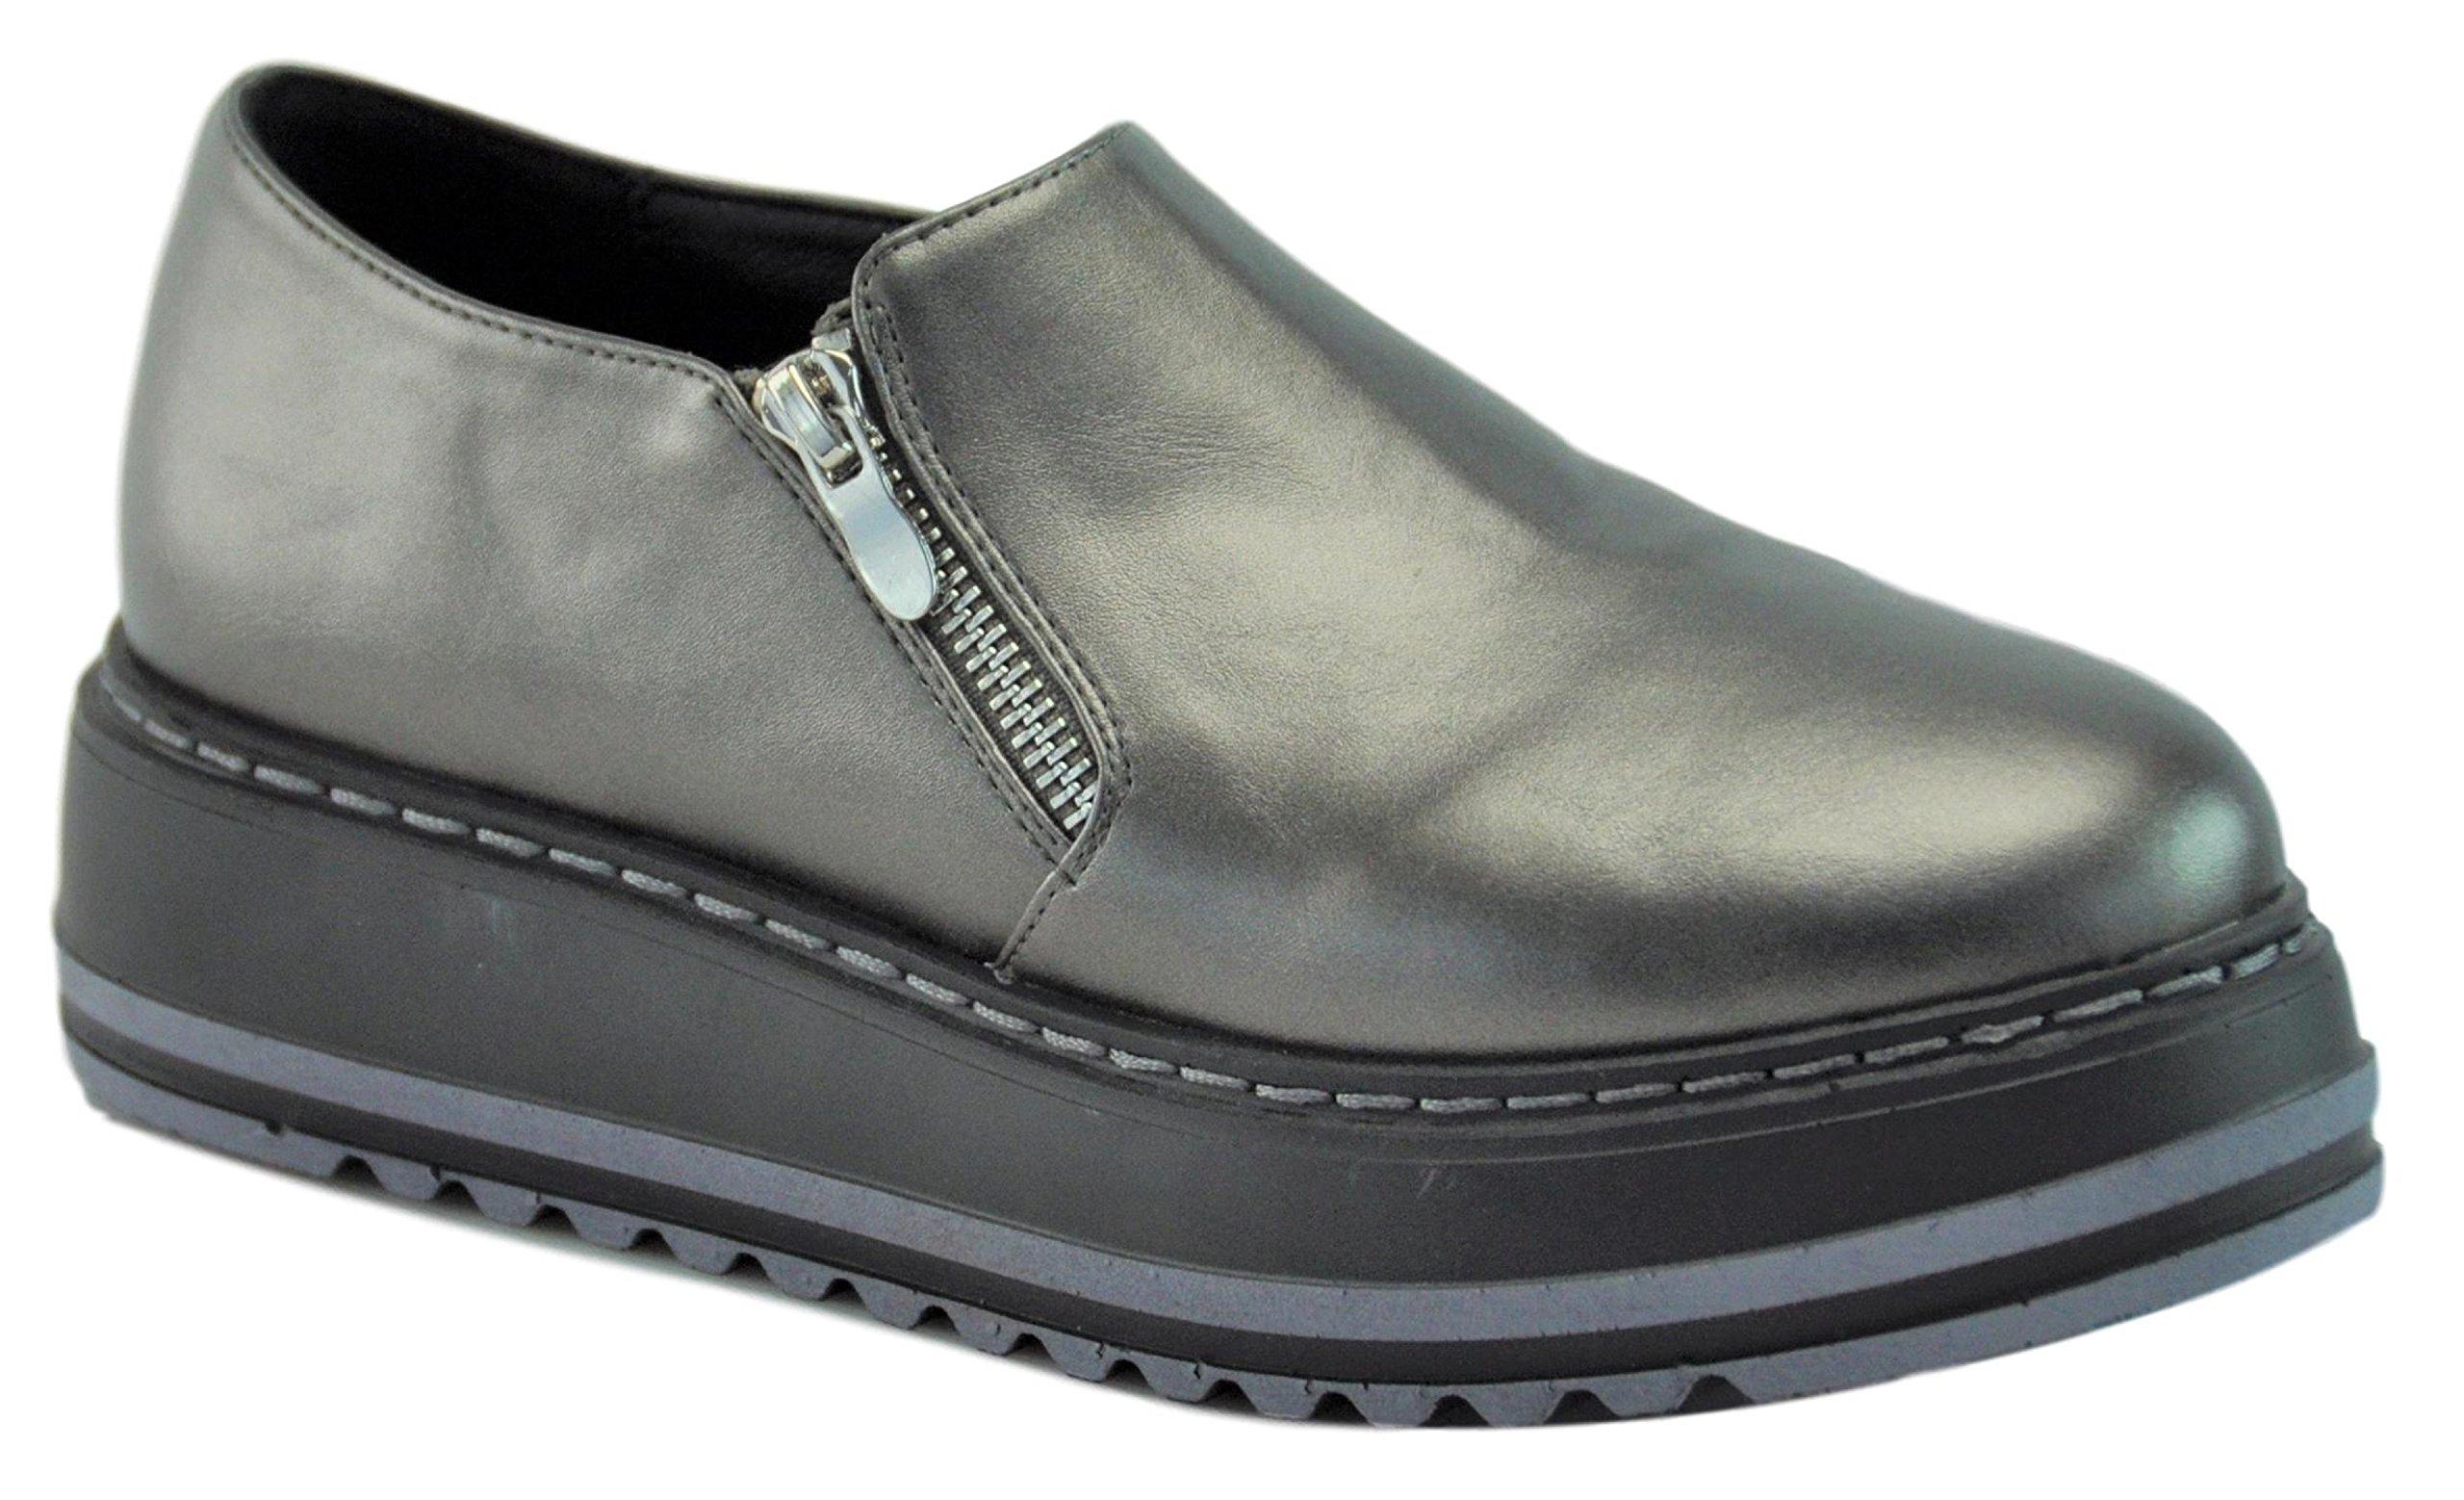 Lynda Top Selling Grey Faux Leather Zipper Flat Platform Wedge Creeper Heel Sexy Cool Fun Nice Mejores Zapatos Altas de Platforma Oxford Shoe for Women Teen Girl (Size 7, Grey)